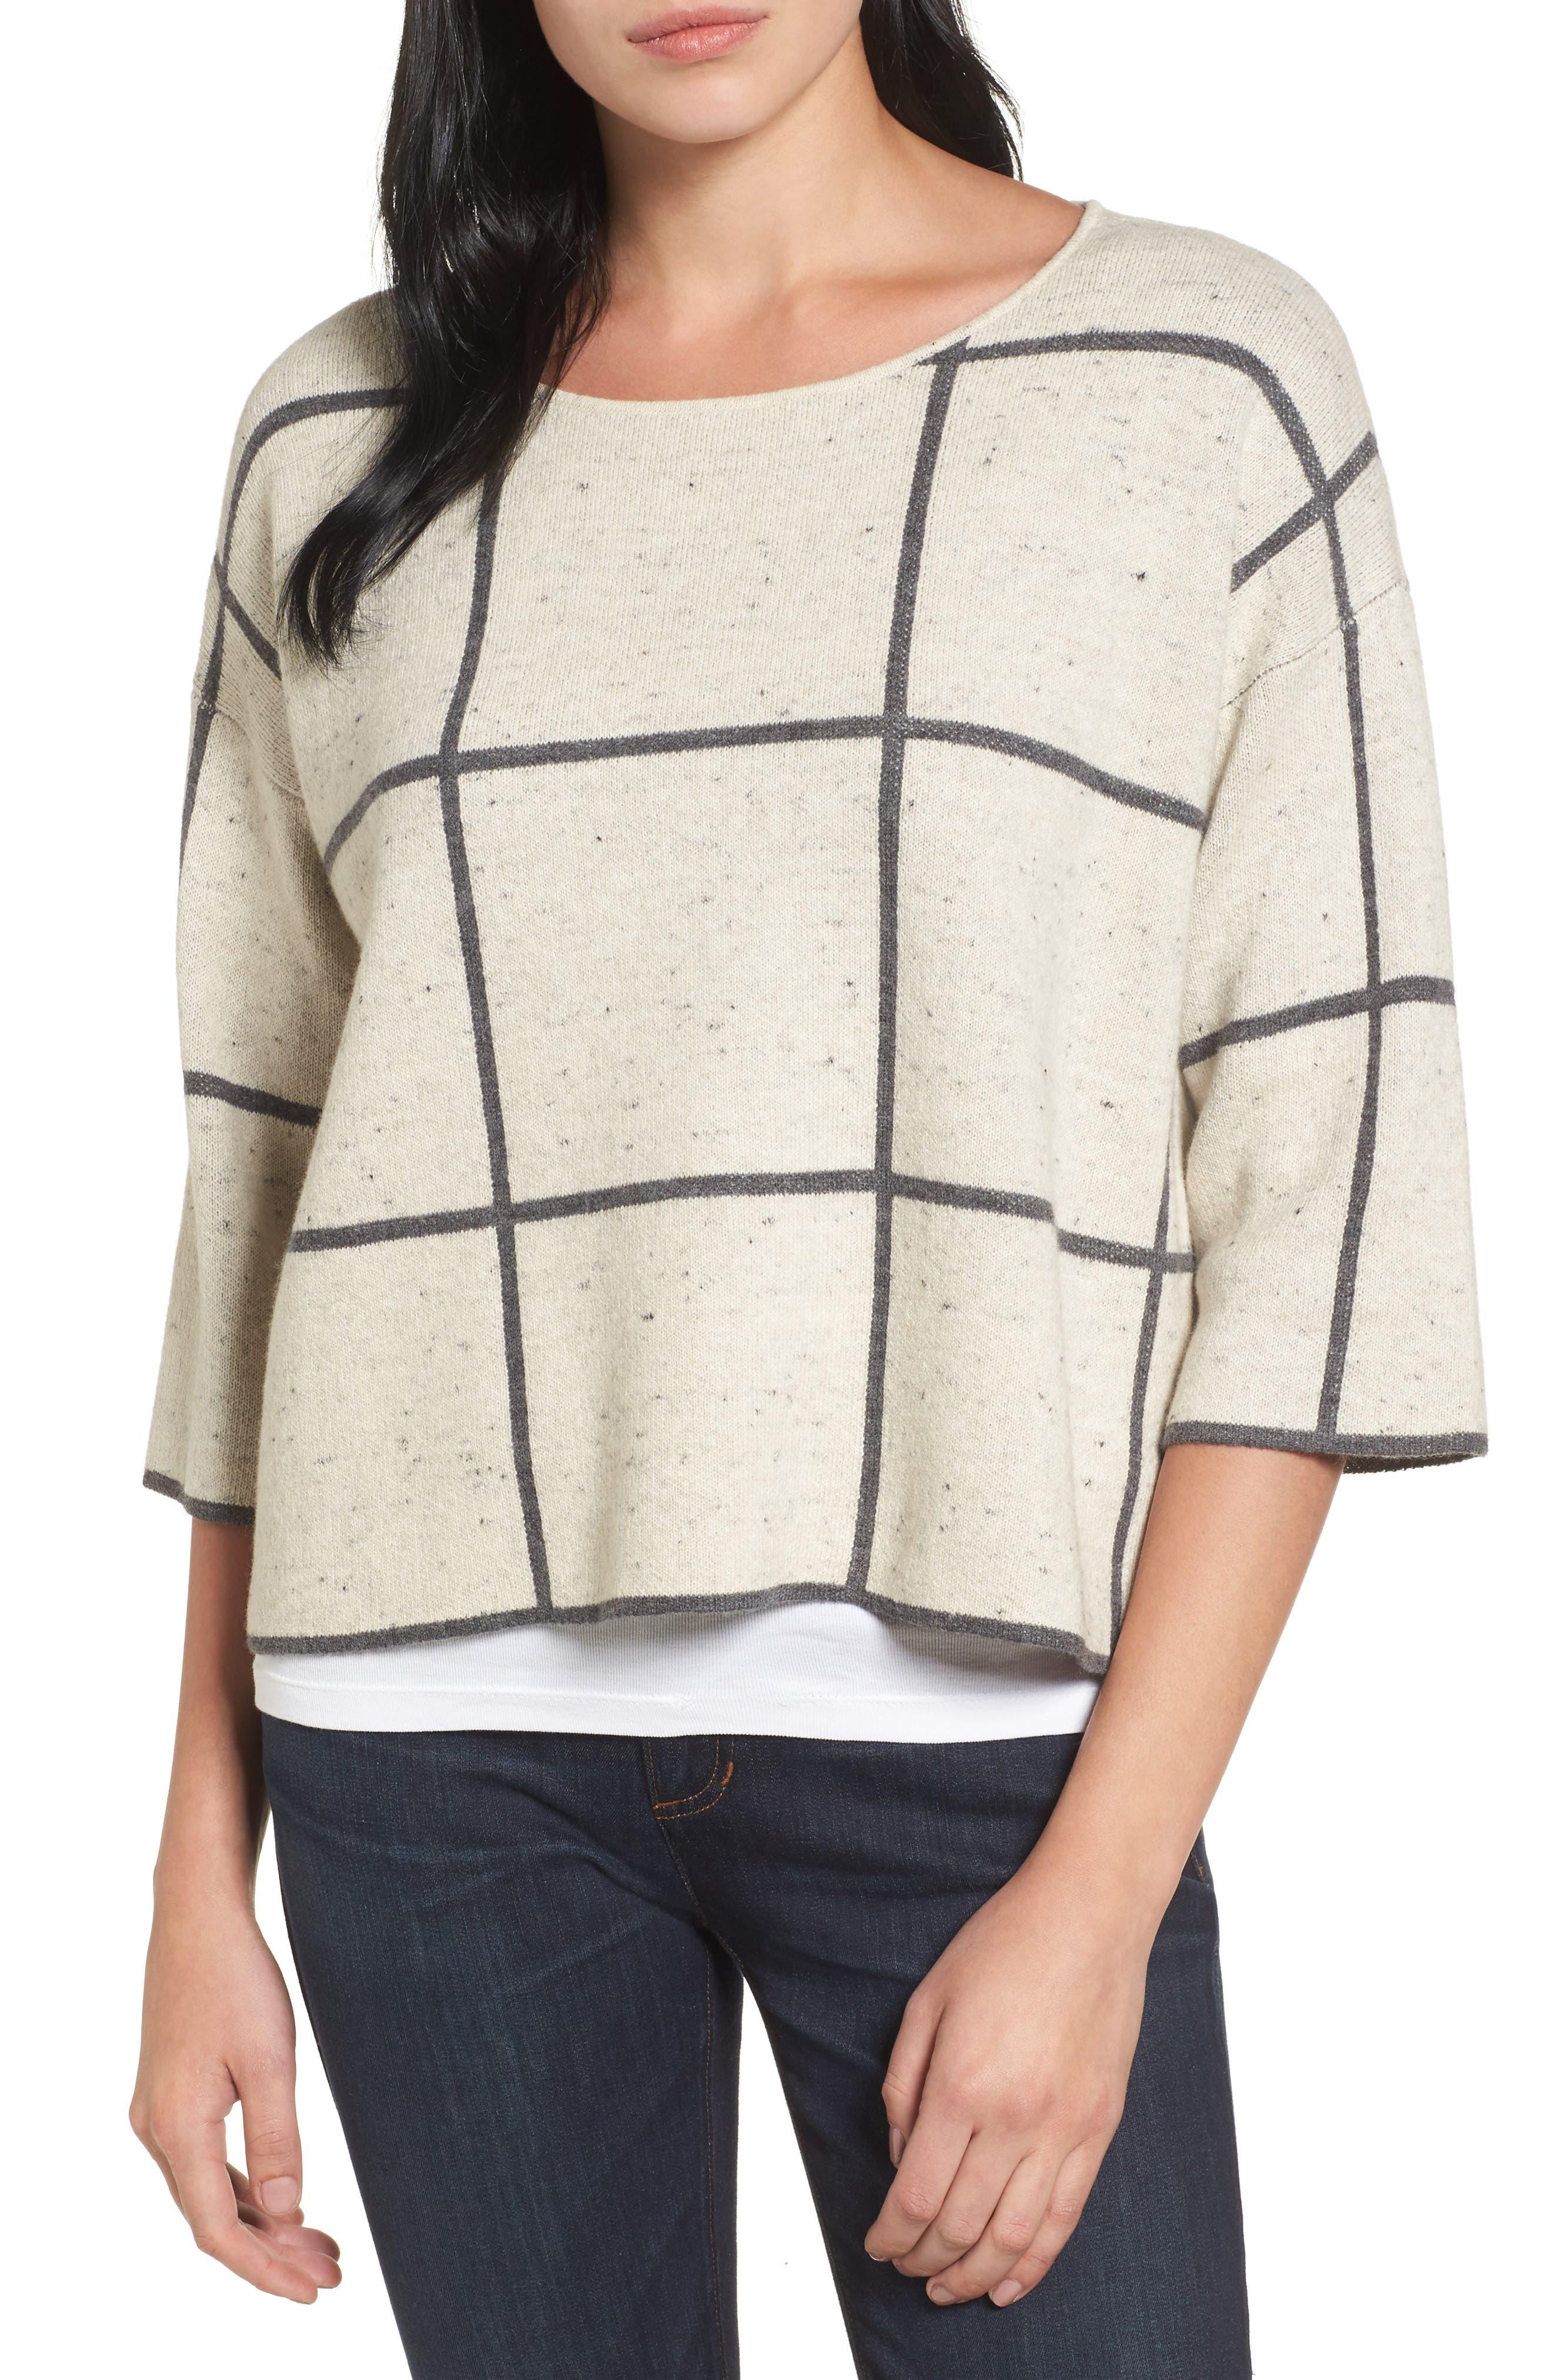 Alternate Image 1 Selected - Eileen Fisher Windowpane Check Boxy Sweater